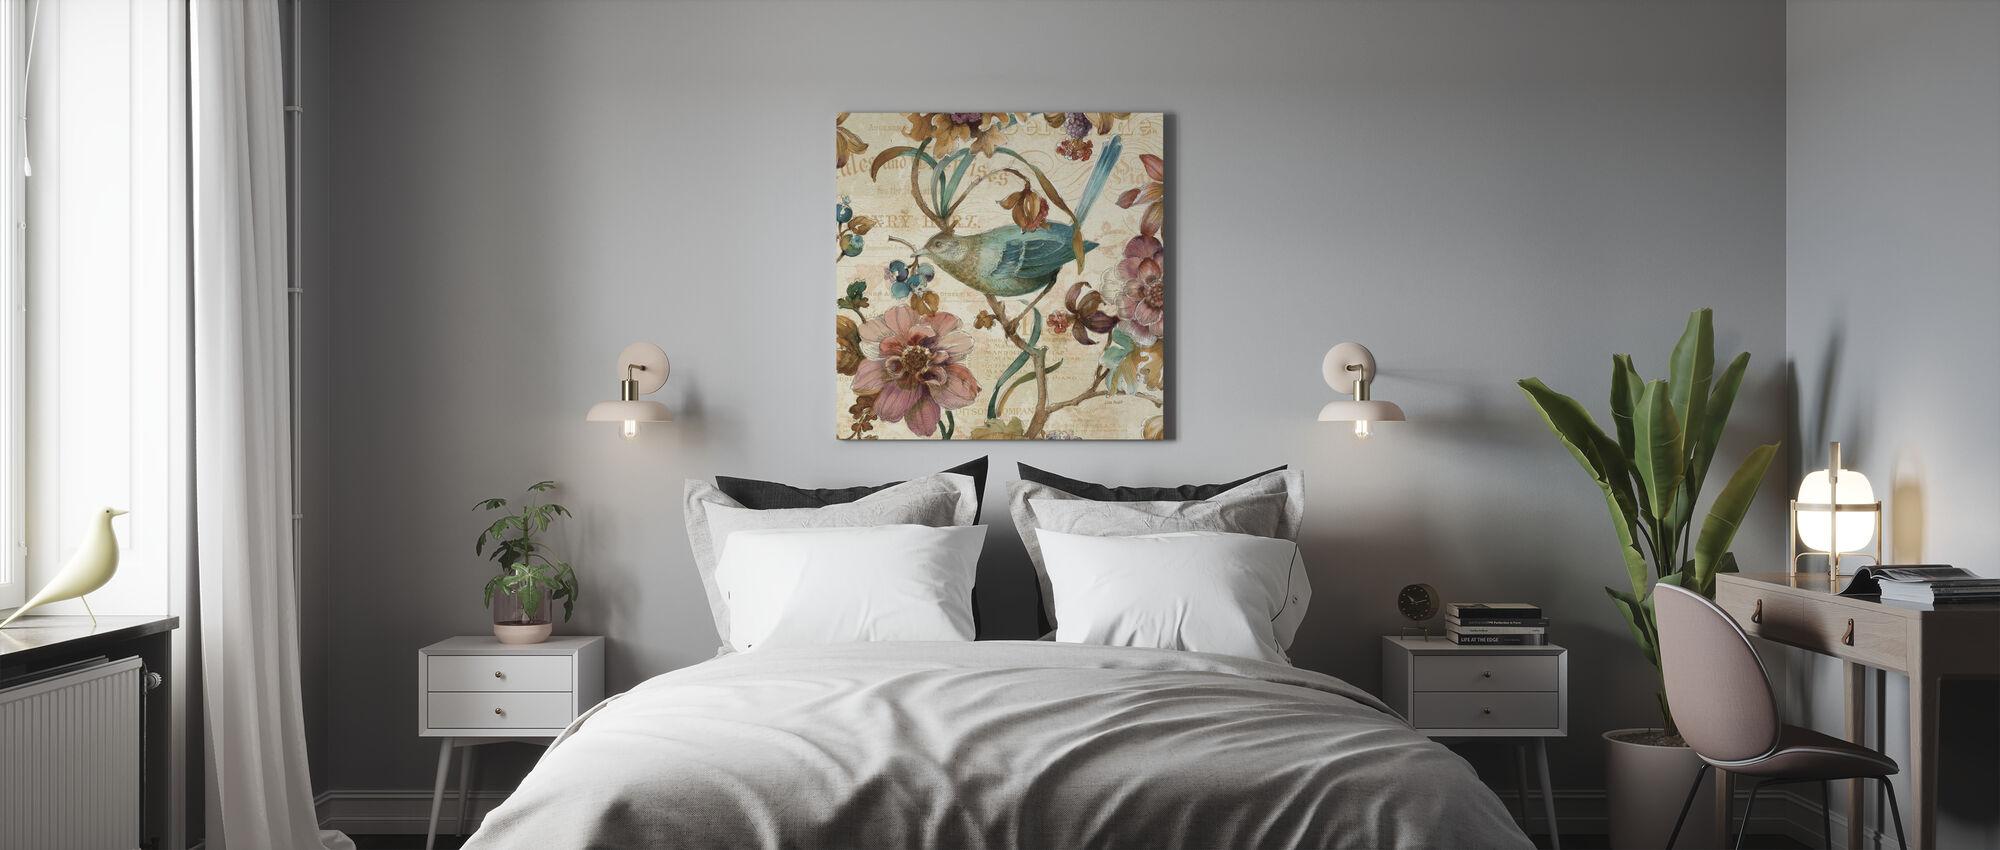 A Garden Moment 2 - Canvas print - Bedroom